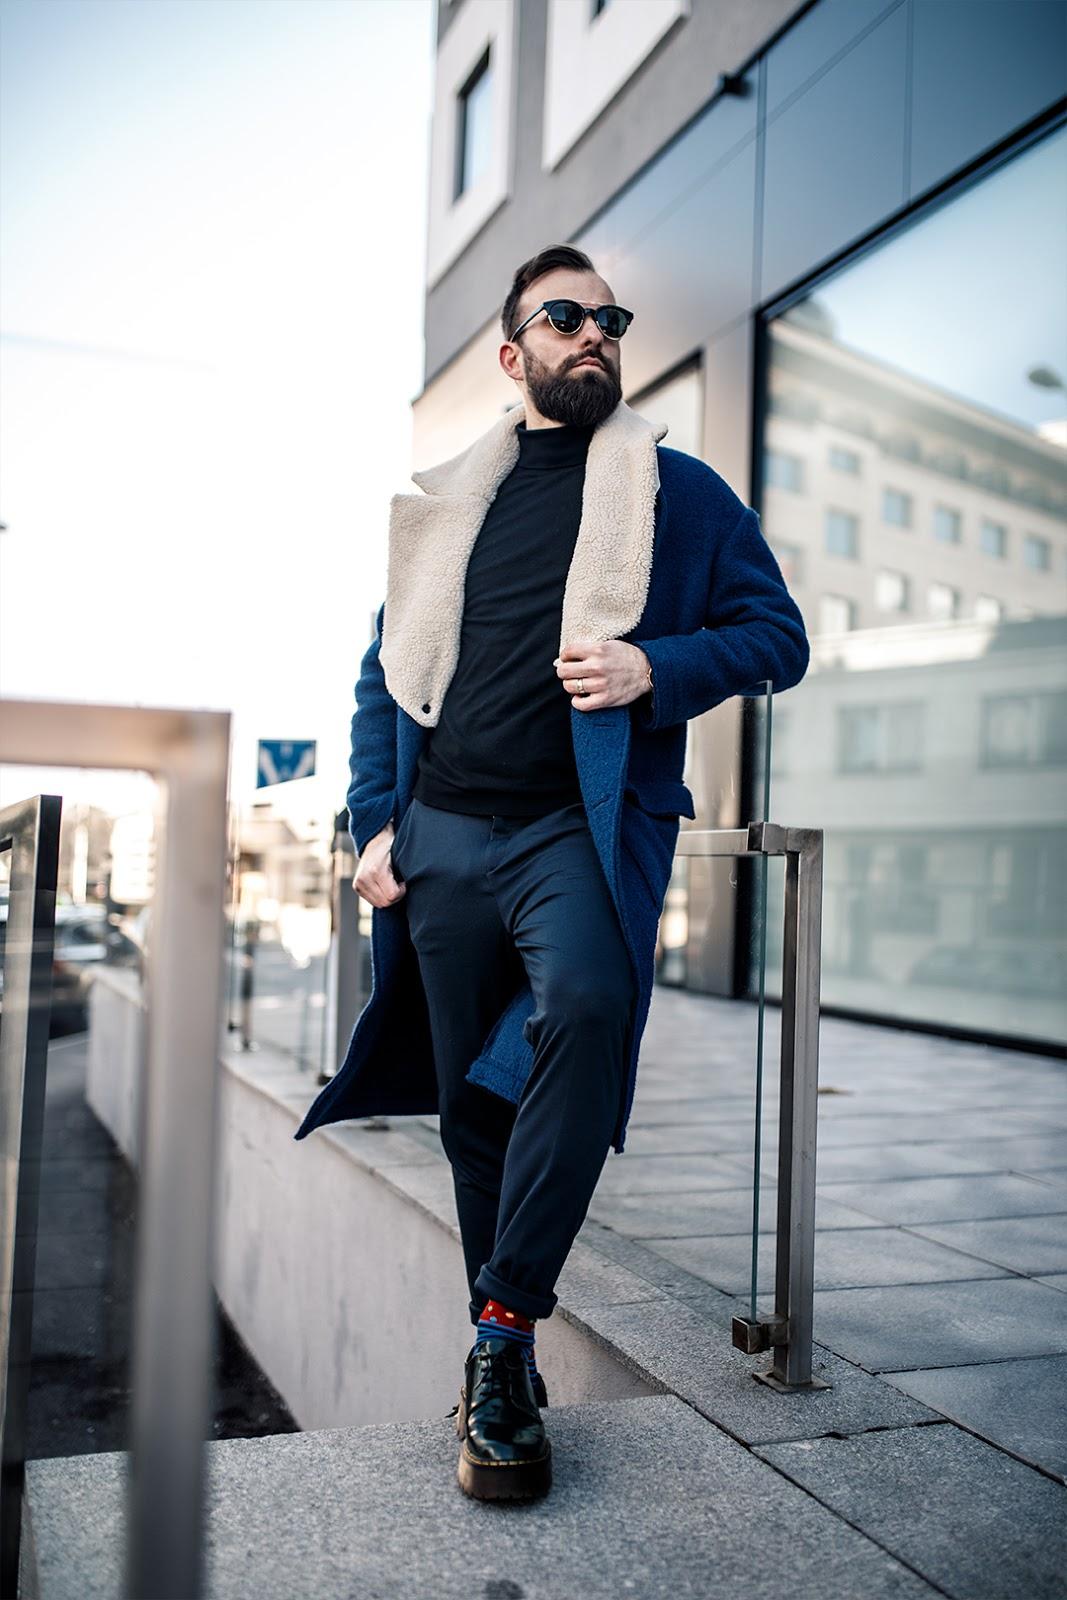 Romilikes moderny gentleman